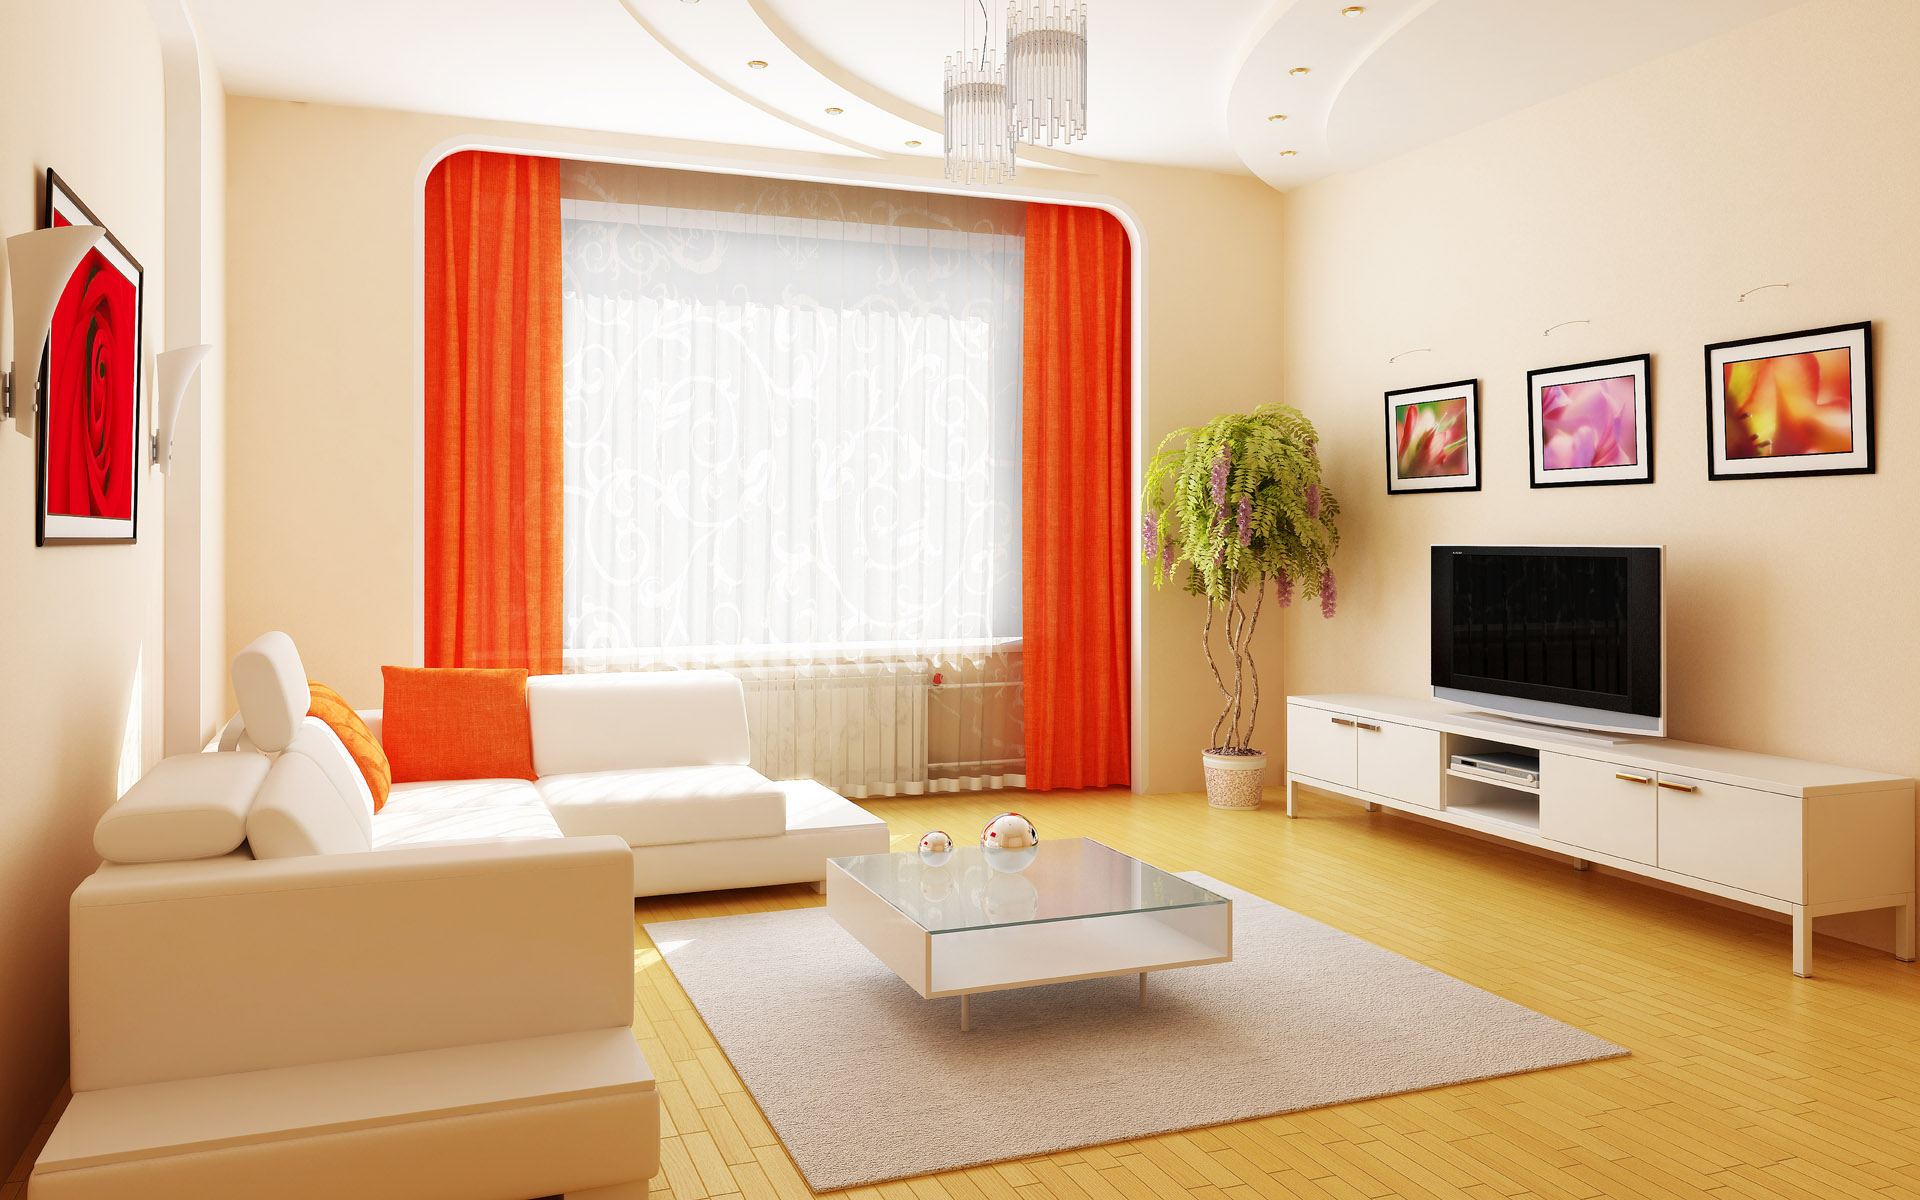 Creative Living Room Interior Design photo - 7